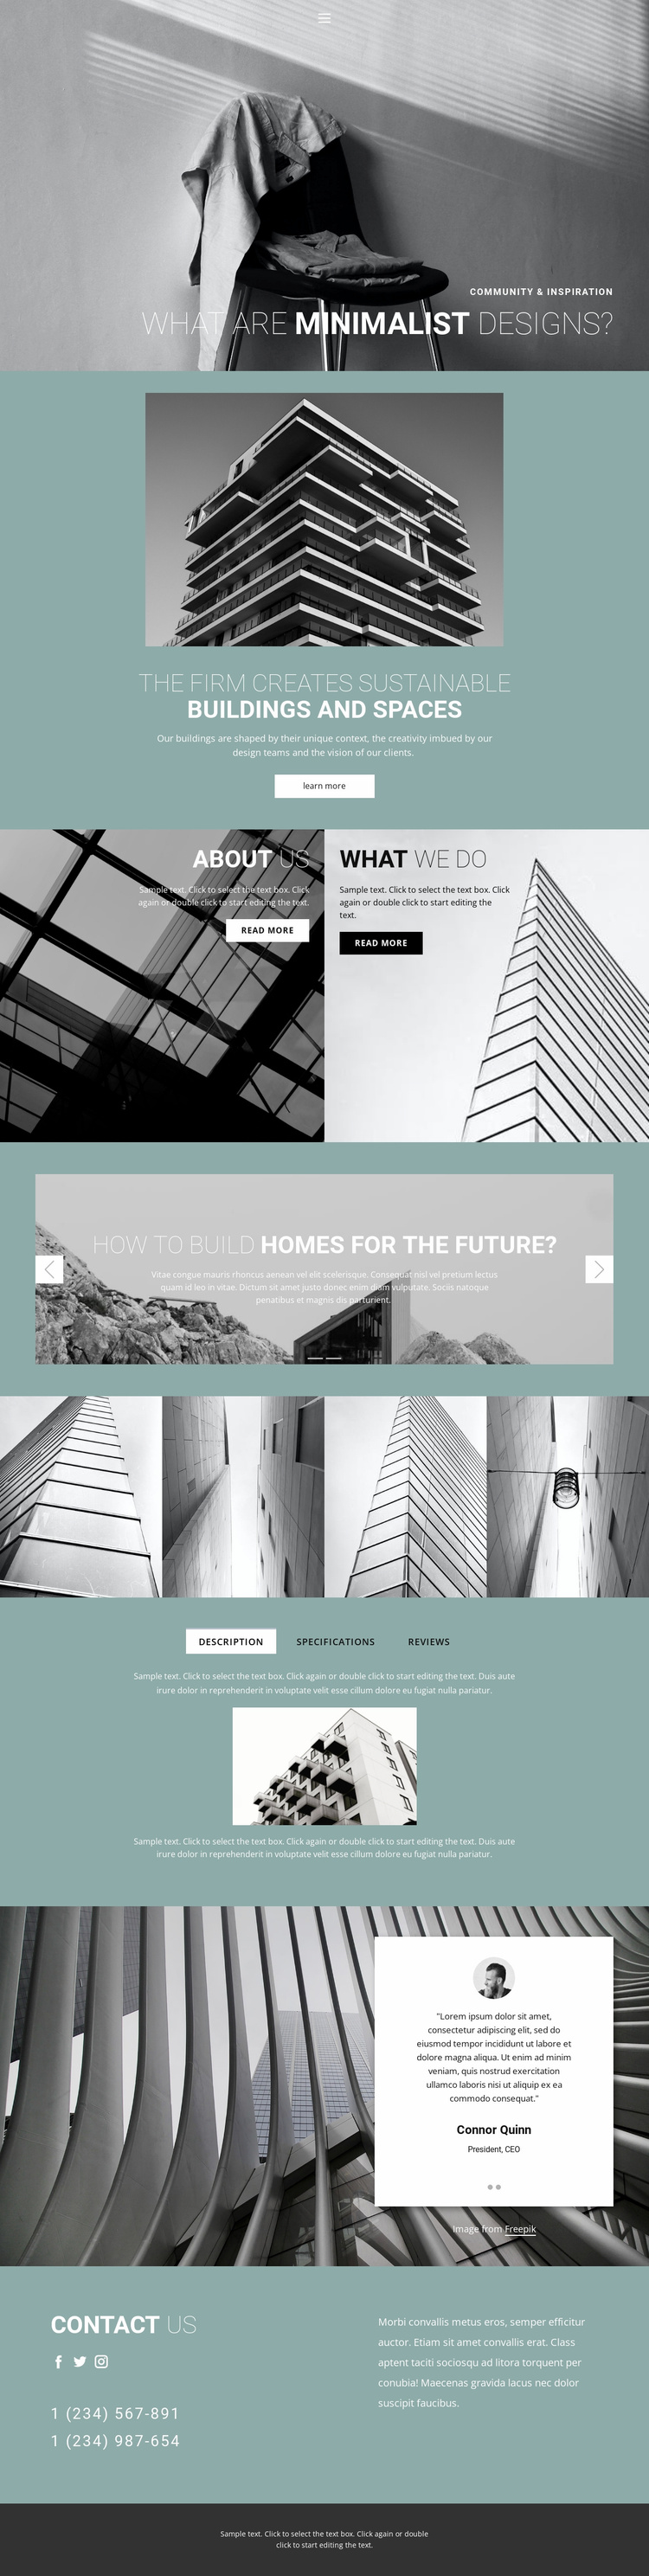 Perfect architecture ideas Website Template